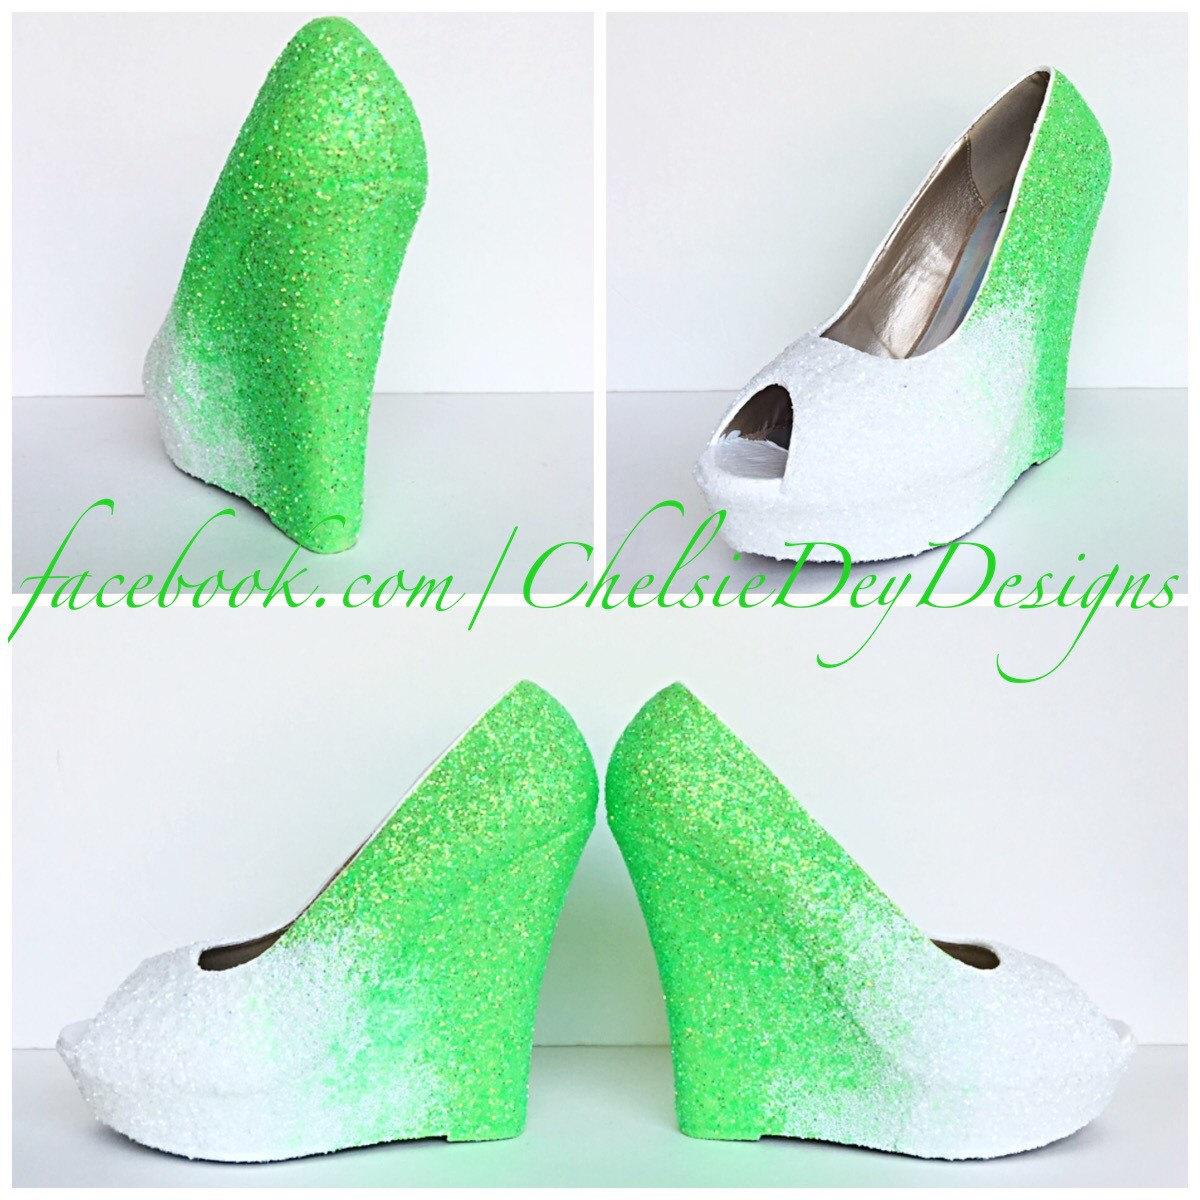 e264e28eae31 Green   White Glitter Wedges - Sparkly Ombre Peep Toe Platform Heel -  Glitzy Open Toe